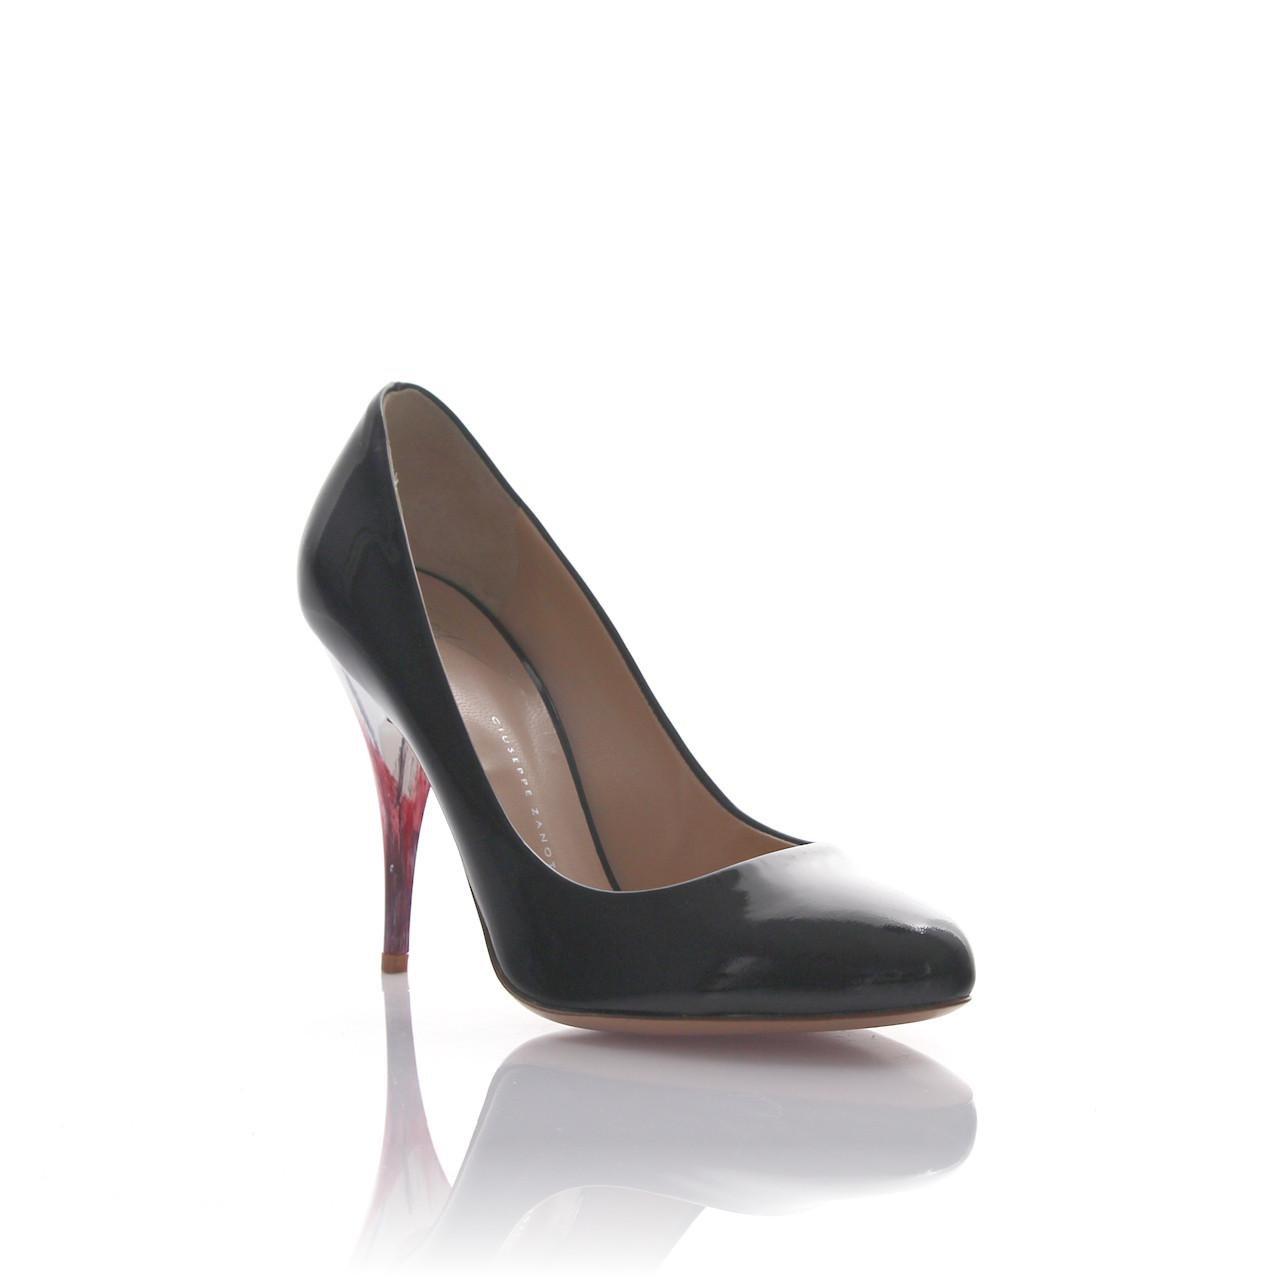 Giuseppe Zanotti Pumps Viv 100 patent leather dqCINW1wJv